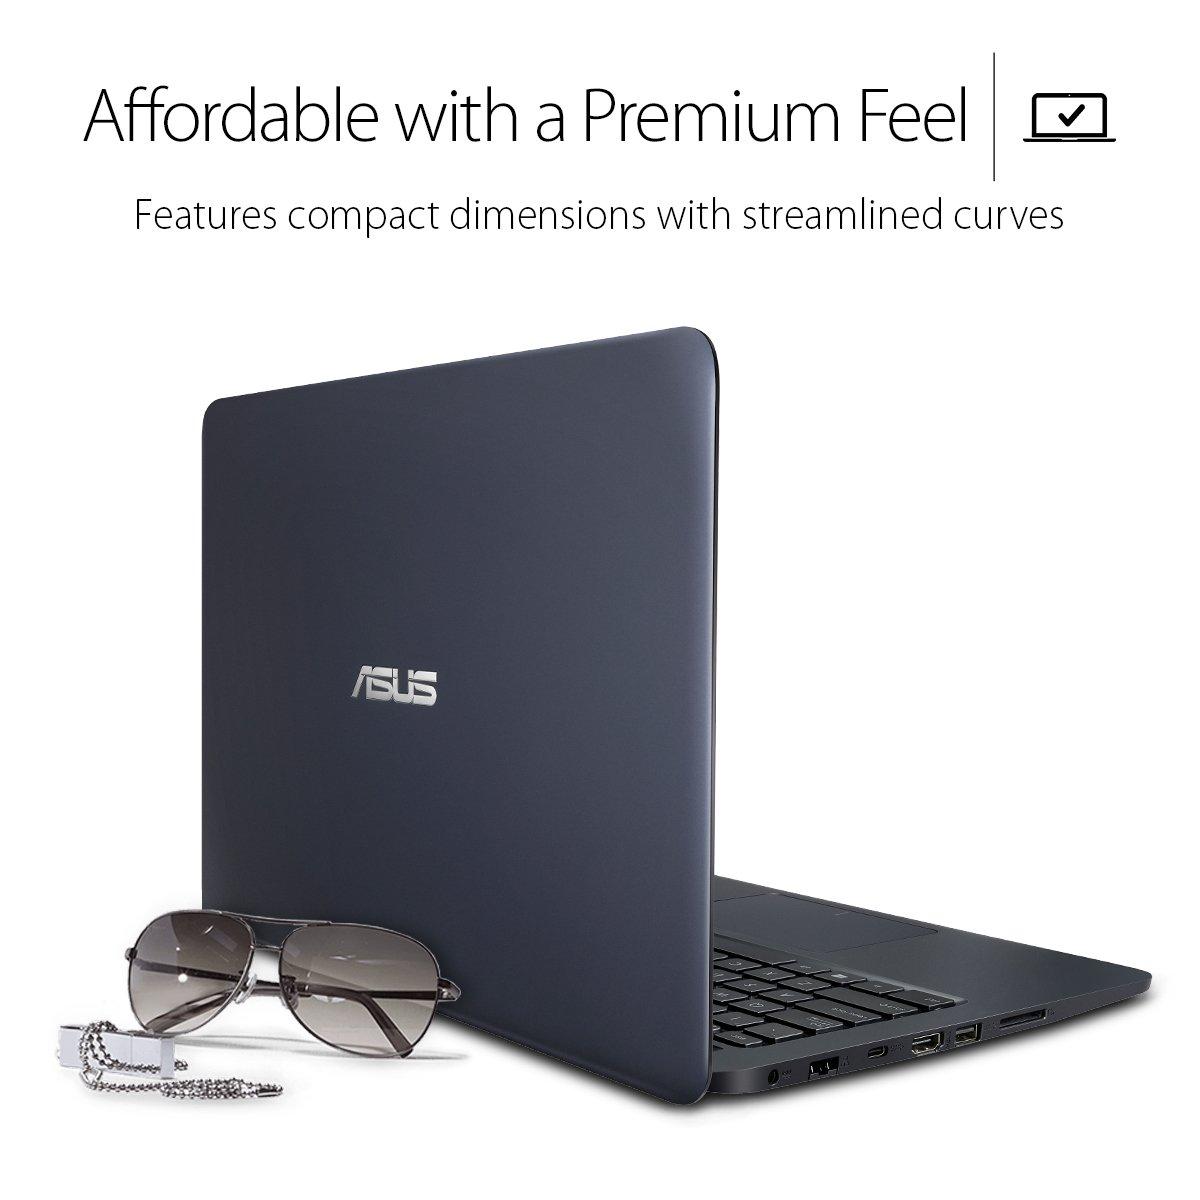 ASUS l402sa-wh02-ofce 1.6 GHz N3060 14 1366 x 768pixel Blanco Computer portátil Notebook/portátil: Amazon.es: Informática